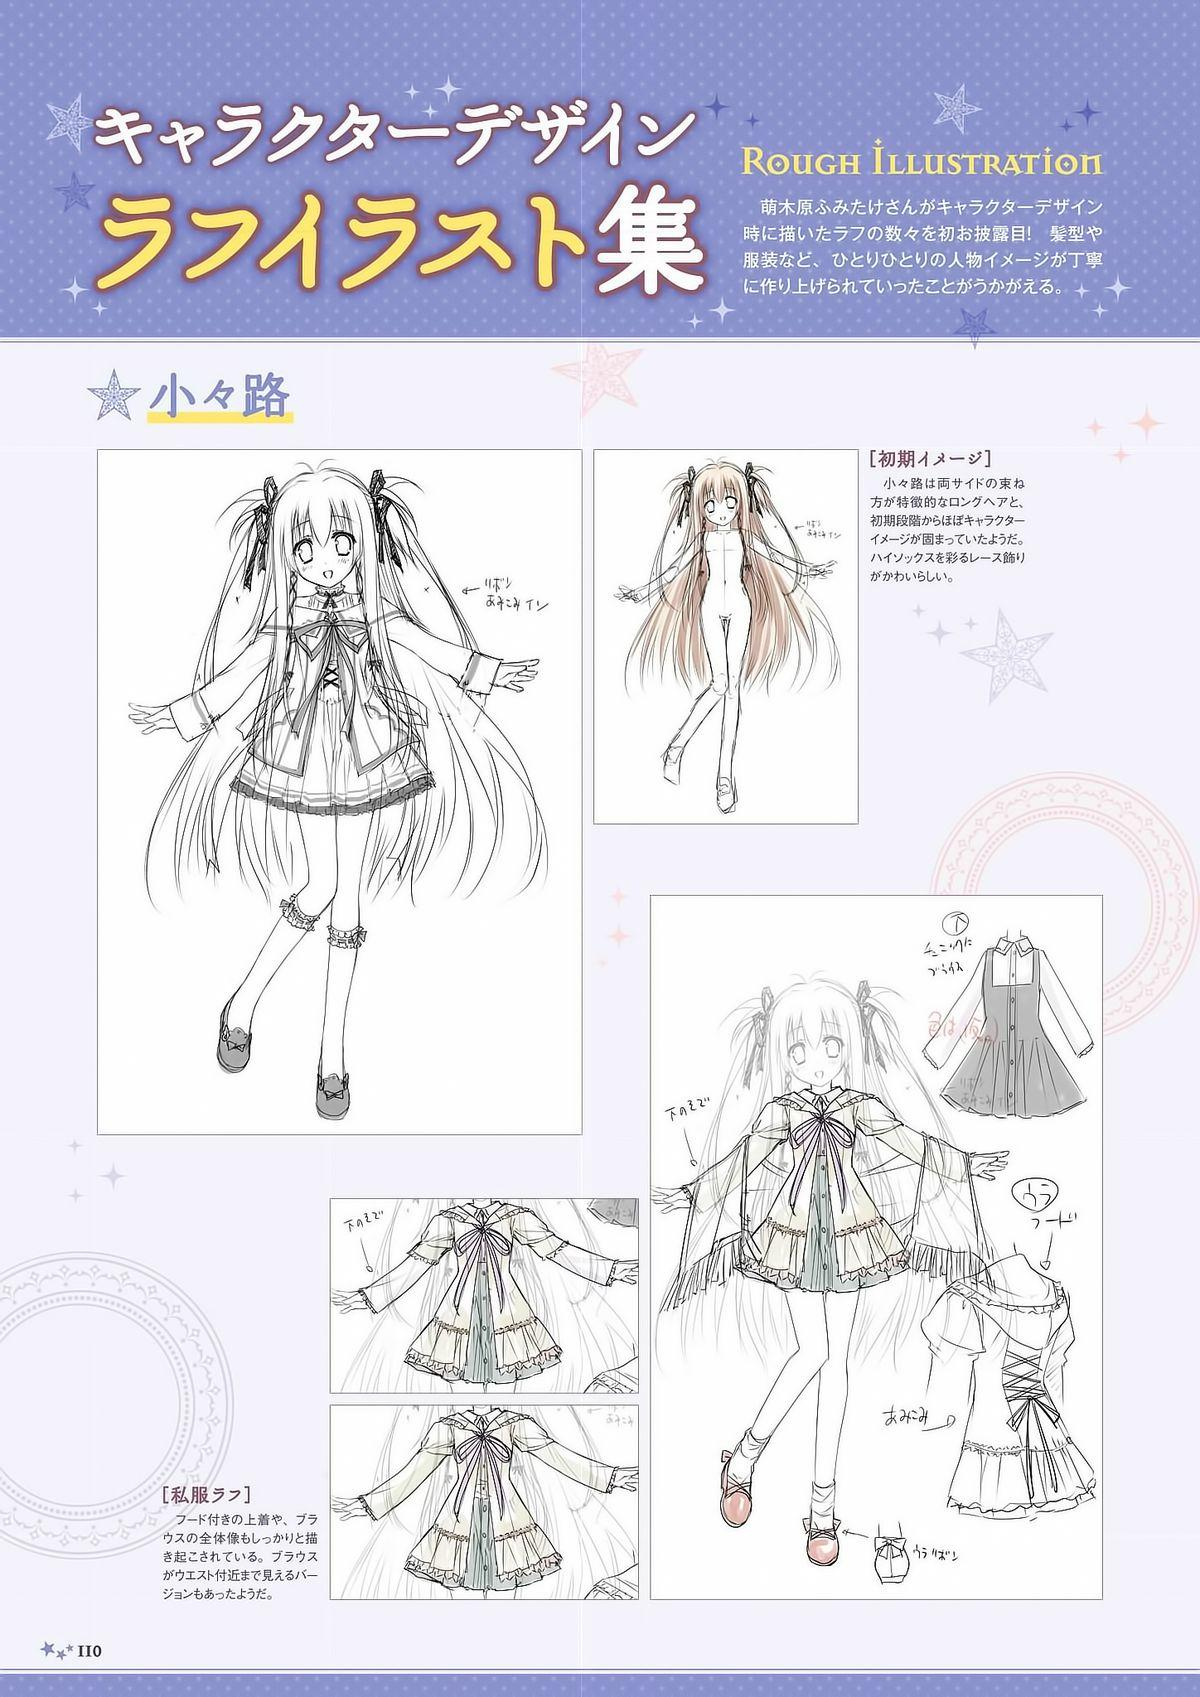 Sekai to Sekai no Mannaka de Visual Fanbook 107